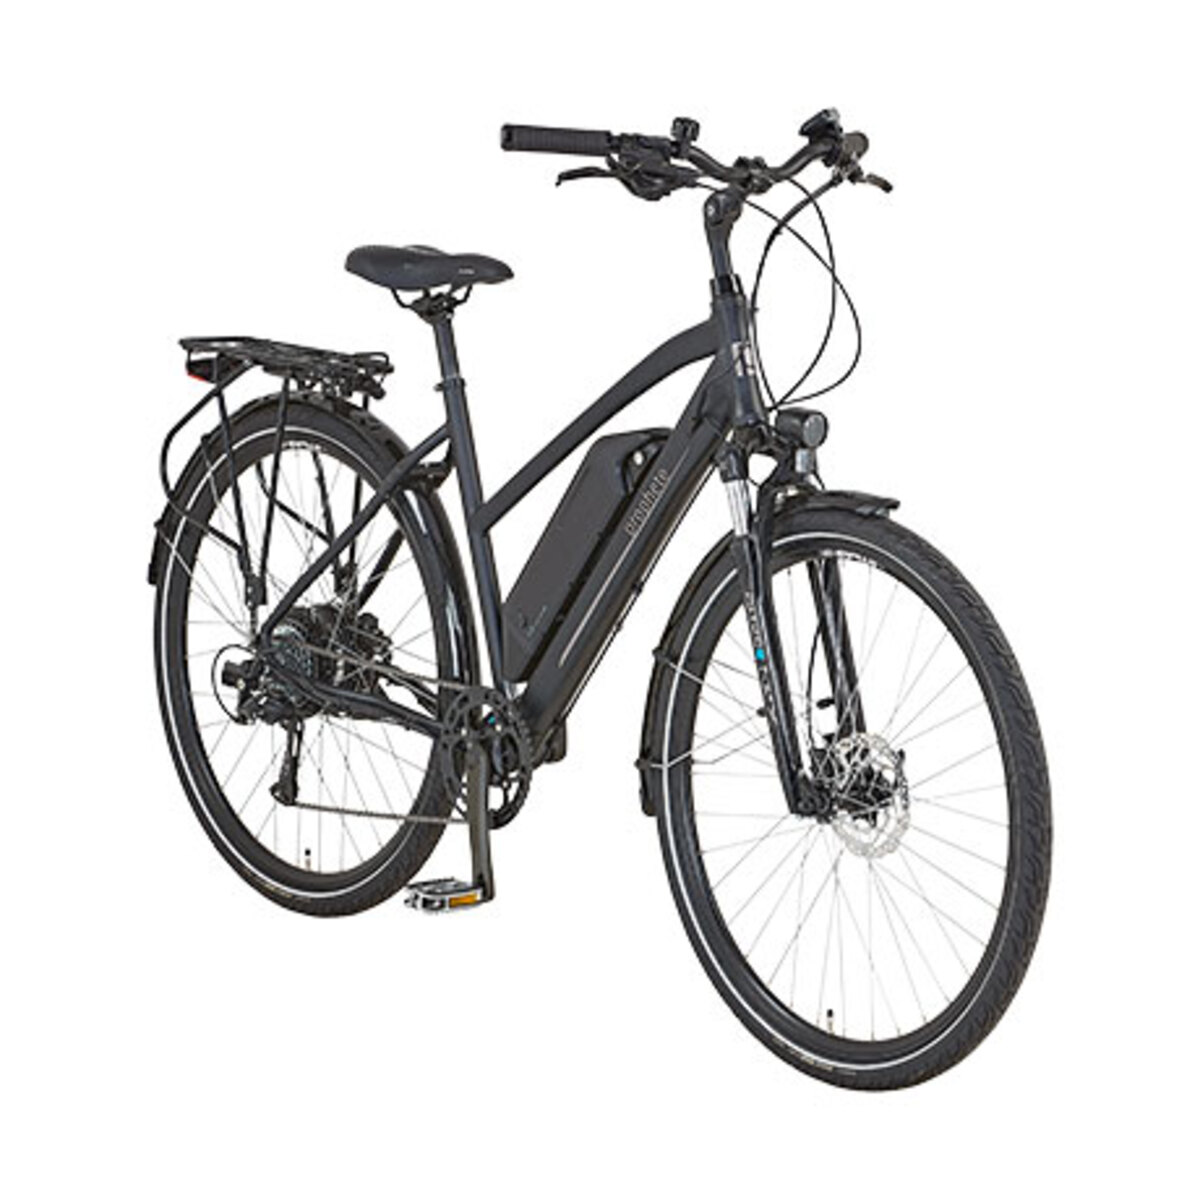 Bild 3 von Trekking-E-Bike Damen1